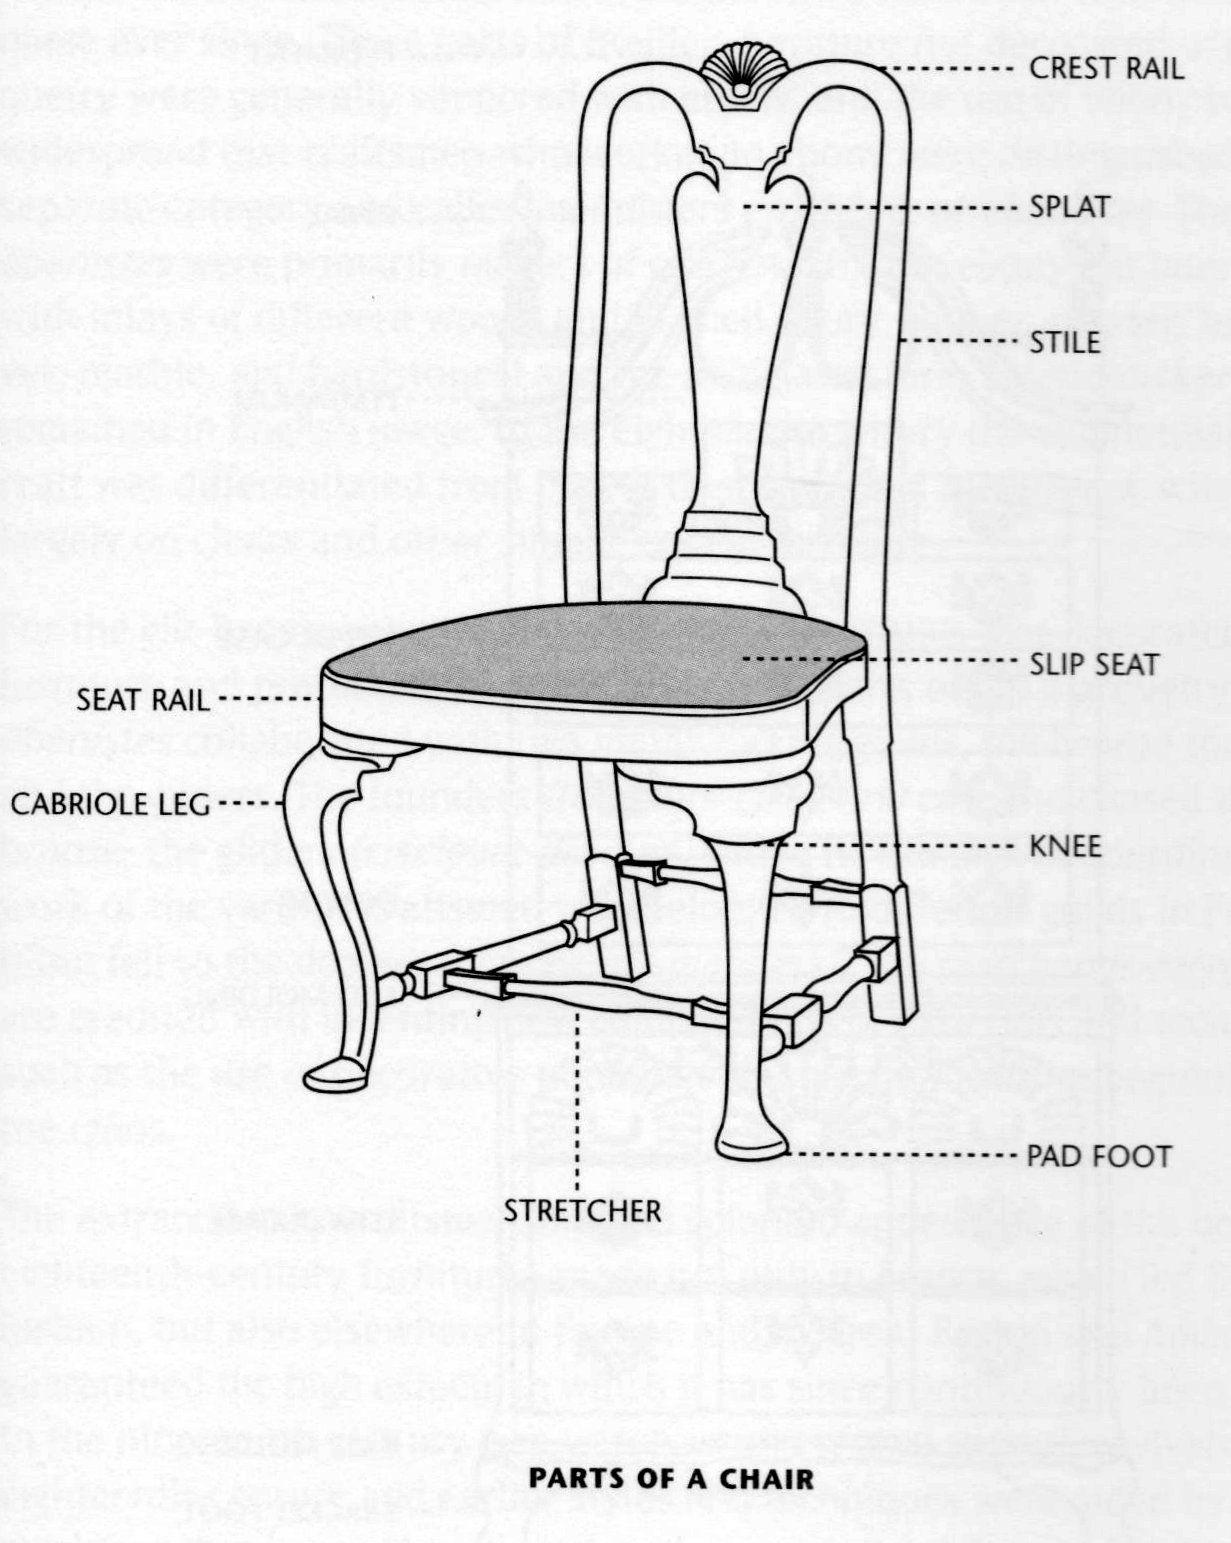 Design Dictionary Splat Stile Or Cabriole In